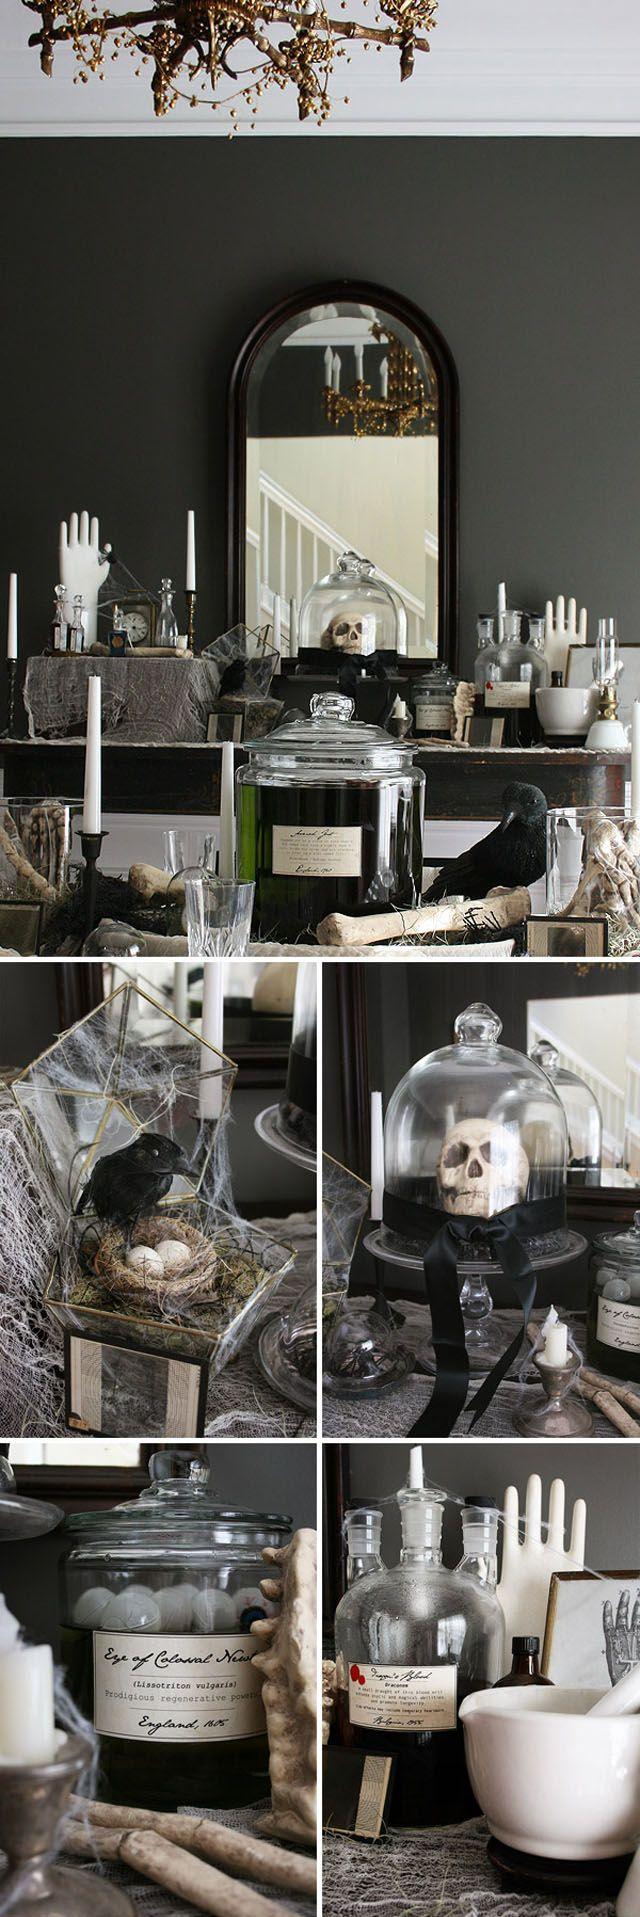 I\u0027m always drawn to black and aged white Halloween decor Classy and - black and white halloween decorations